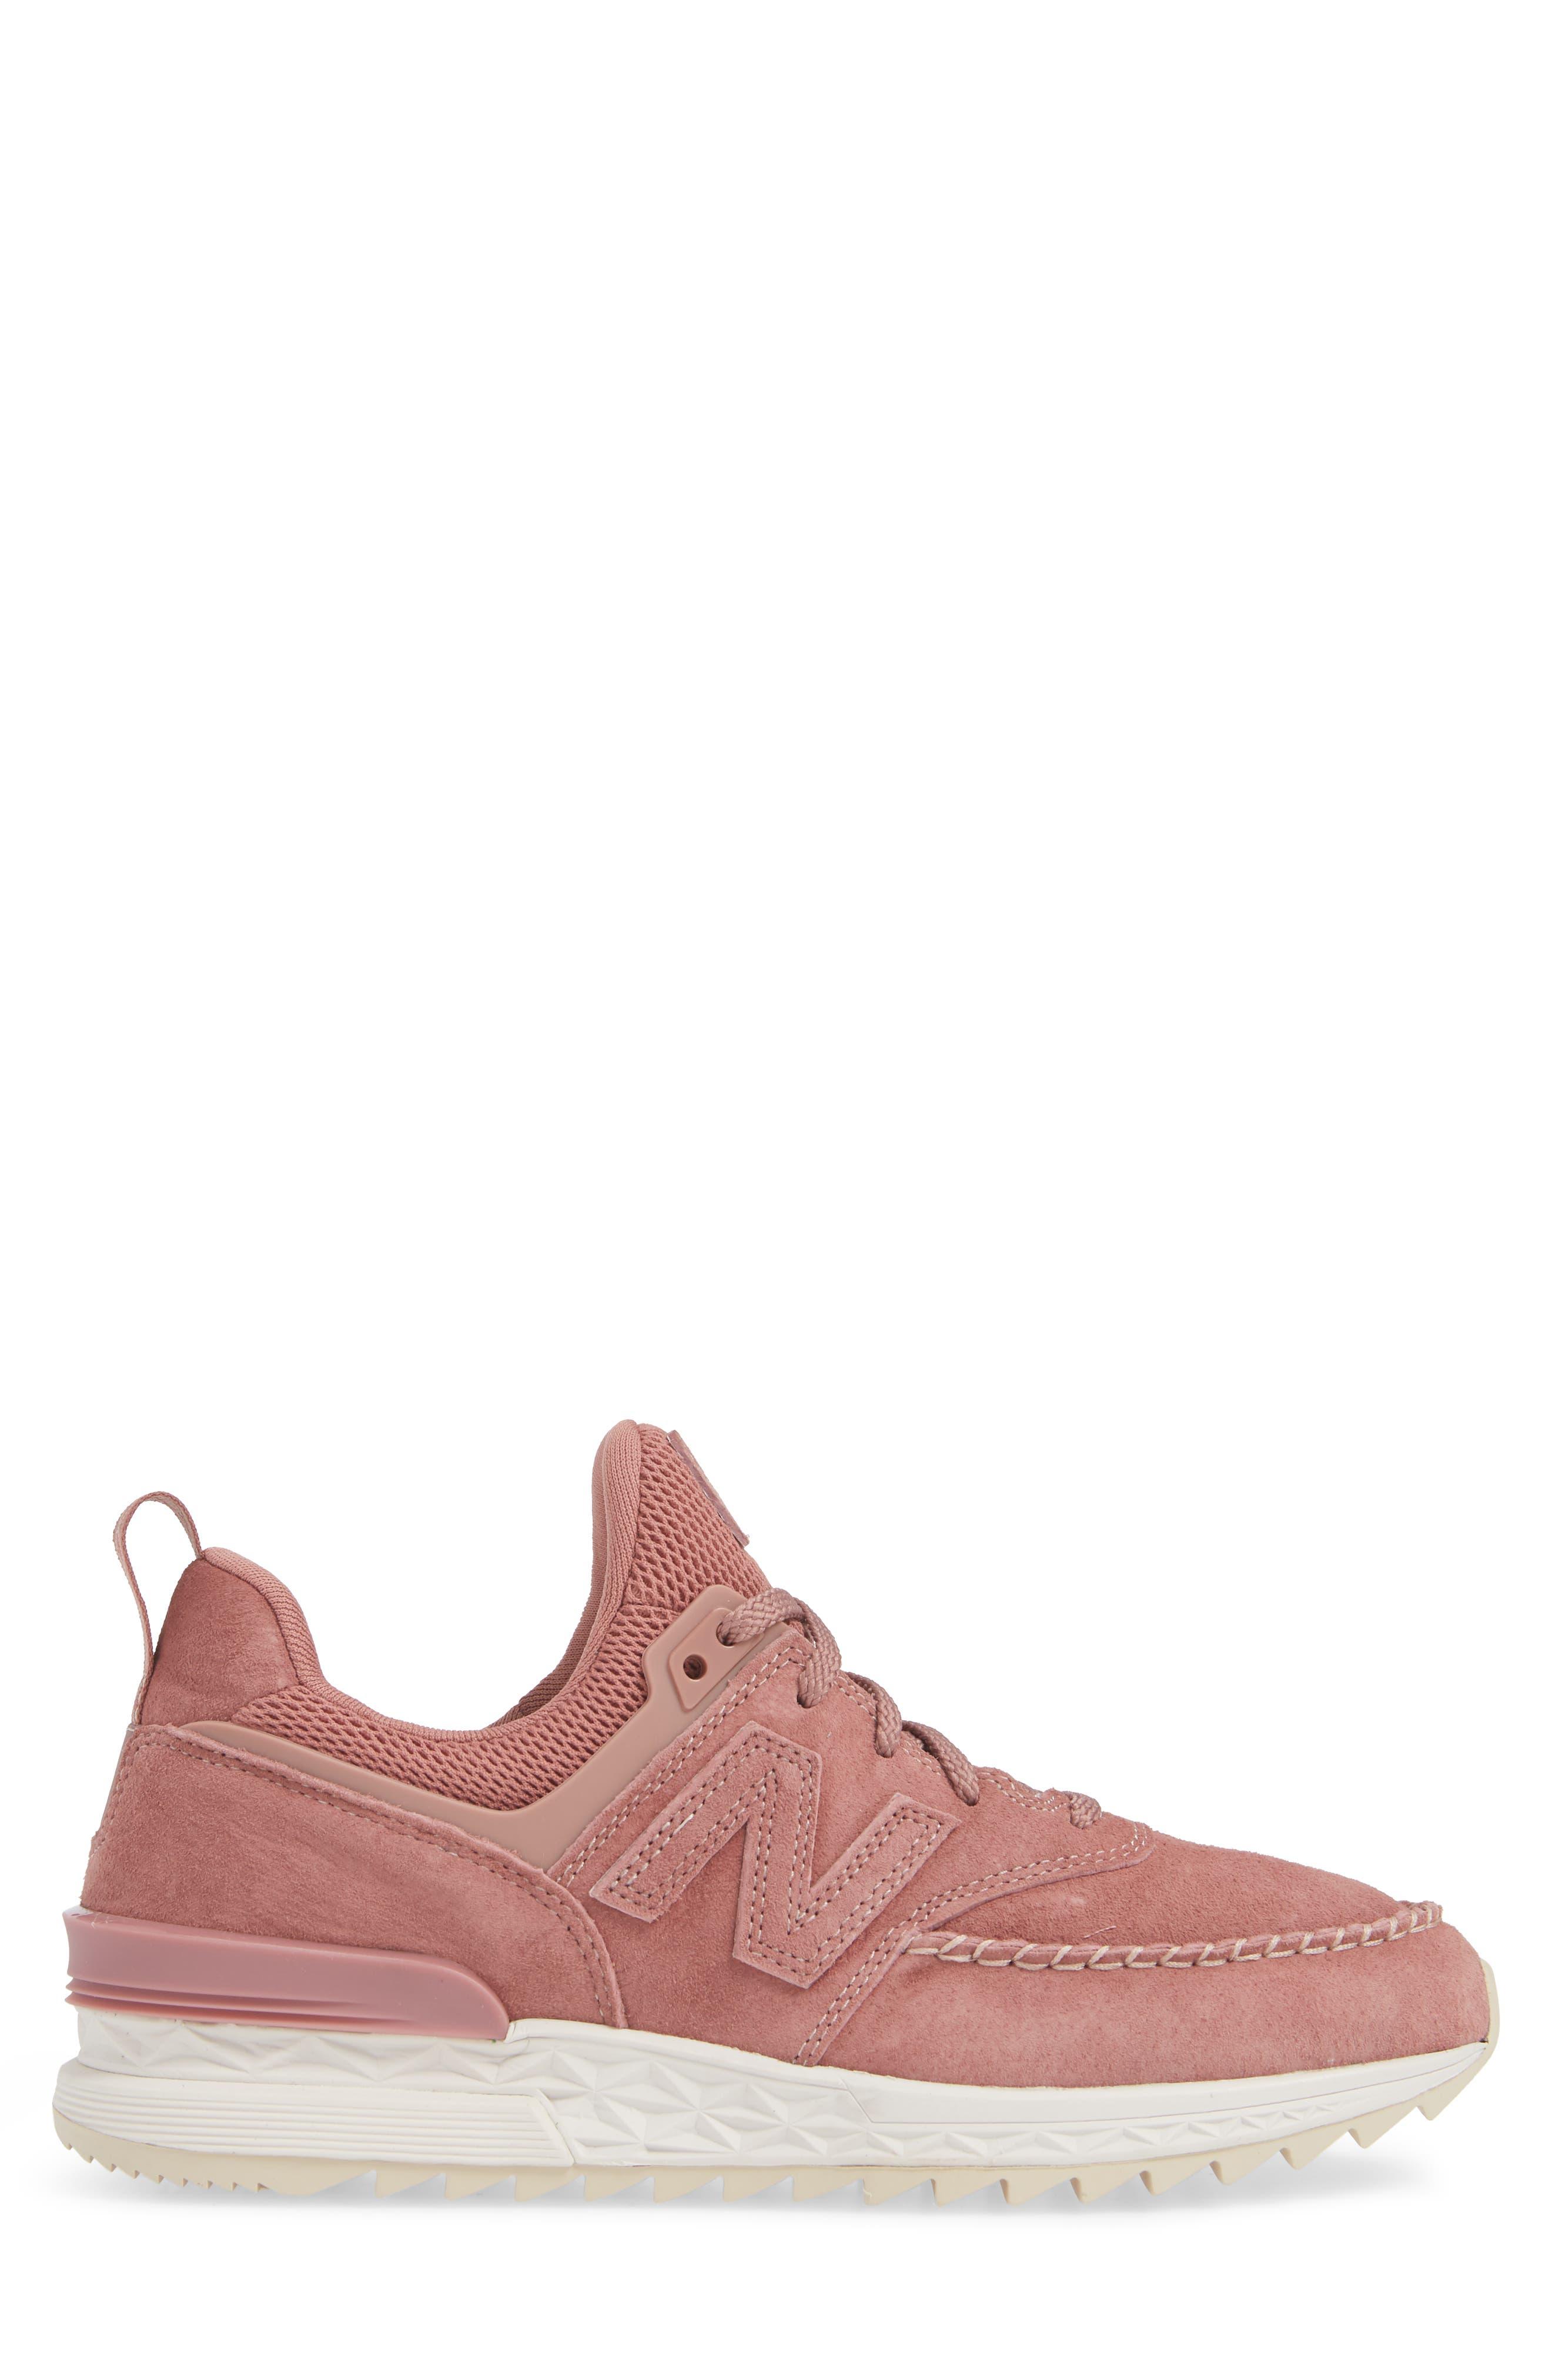 574 Sport Sneaker,                             Alternate thumbnail 3, color,                             DARK OXIDE SUEDE/ MESH